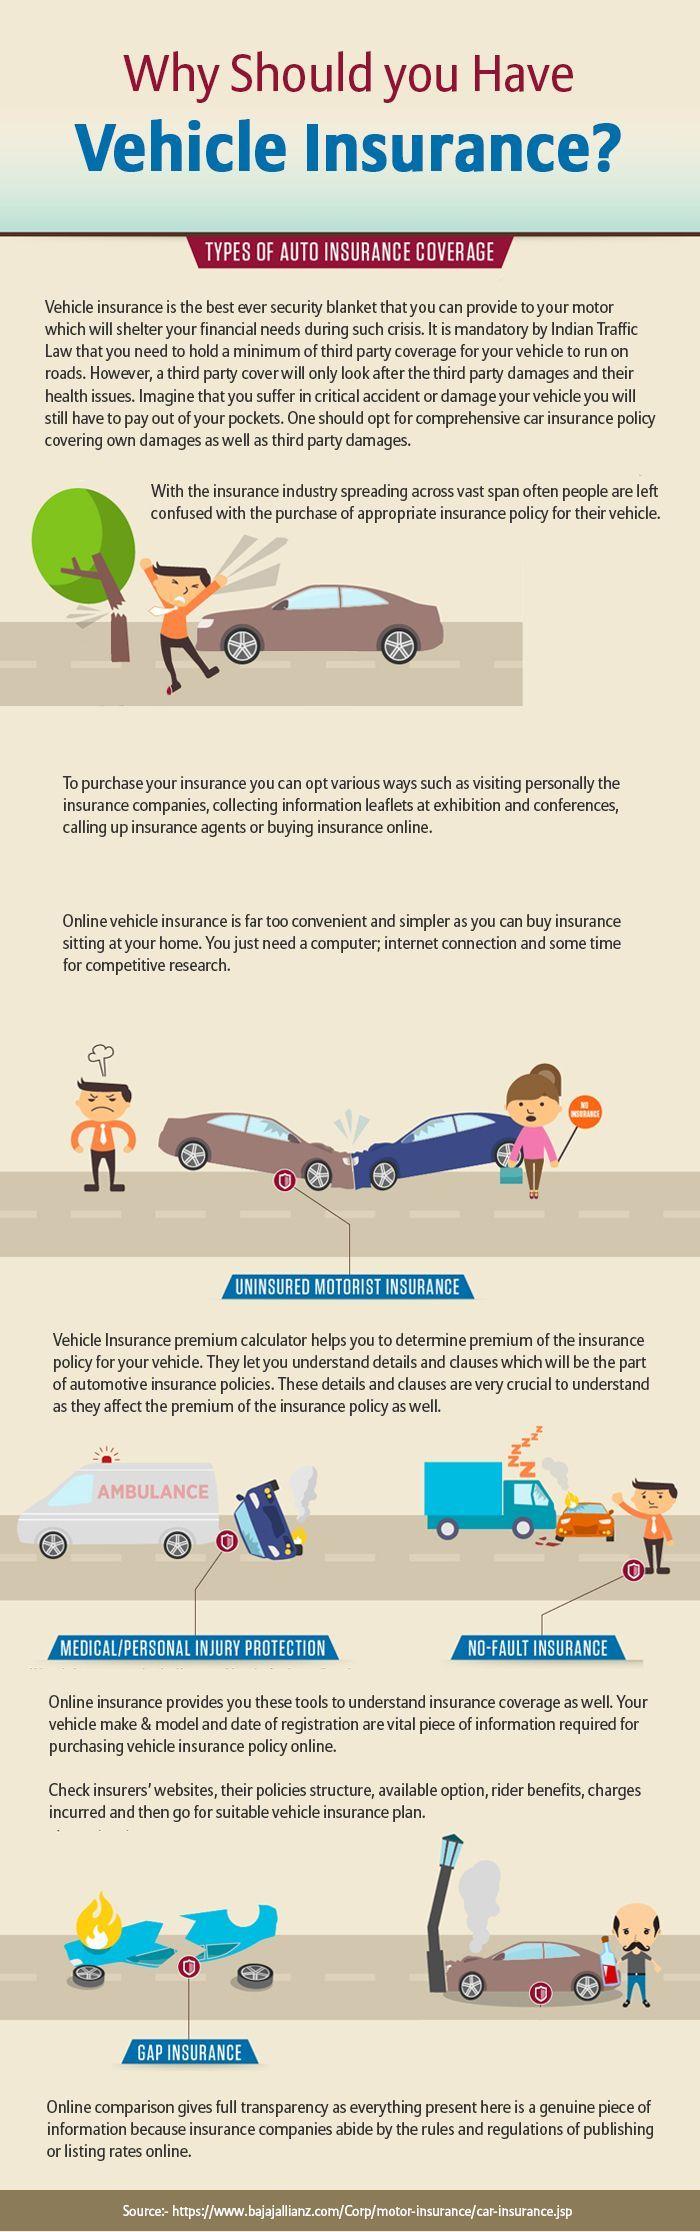 Buy or renew car insurance policies online. Buy car insurance policy in easy steps. Get 24x7 spot assistance cover Car Insurance policy. Visit more information: https://www.bajajallianz.com/Corp/motor-insurance/car-insurance.jsp #CarInsurance&Cars